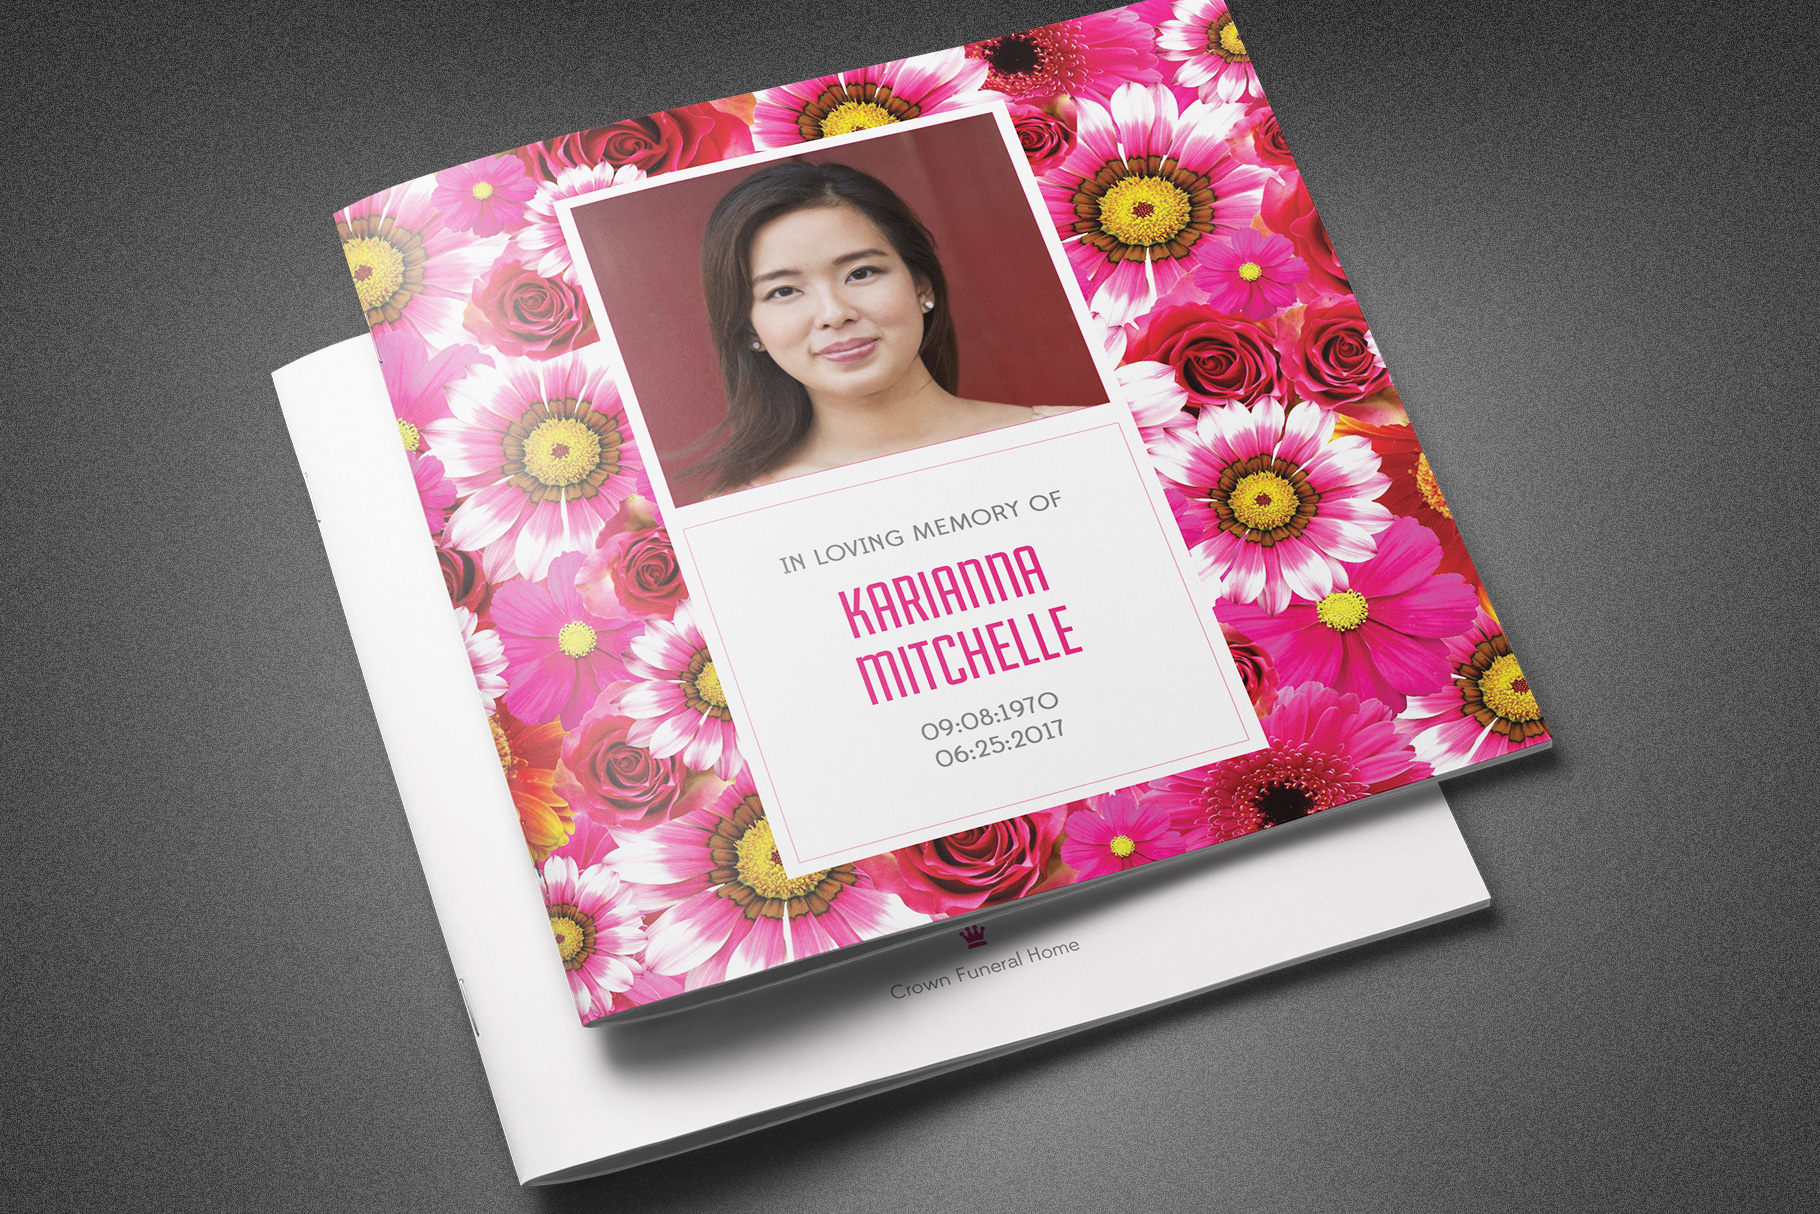 Flower Bud Funeral Program Template example image 1